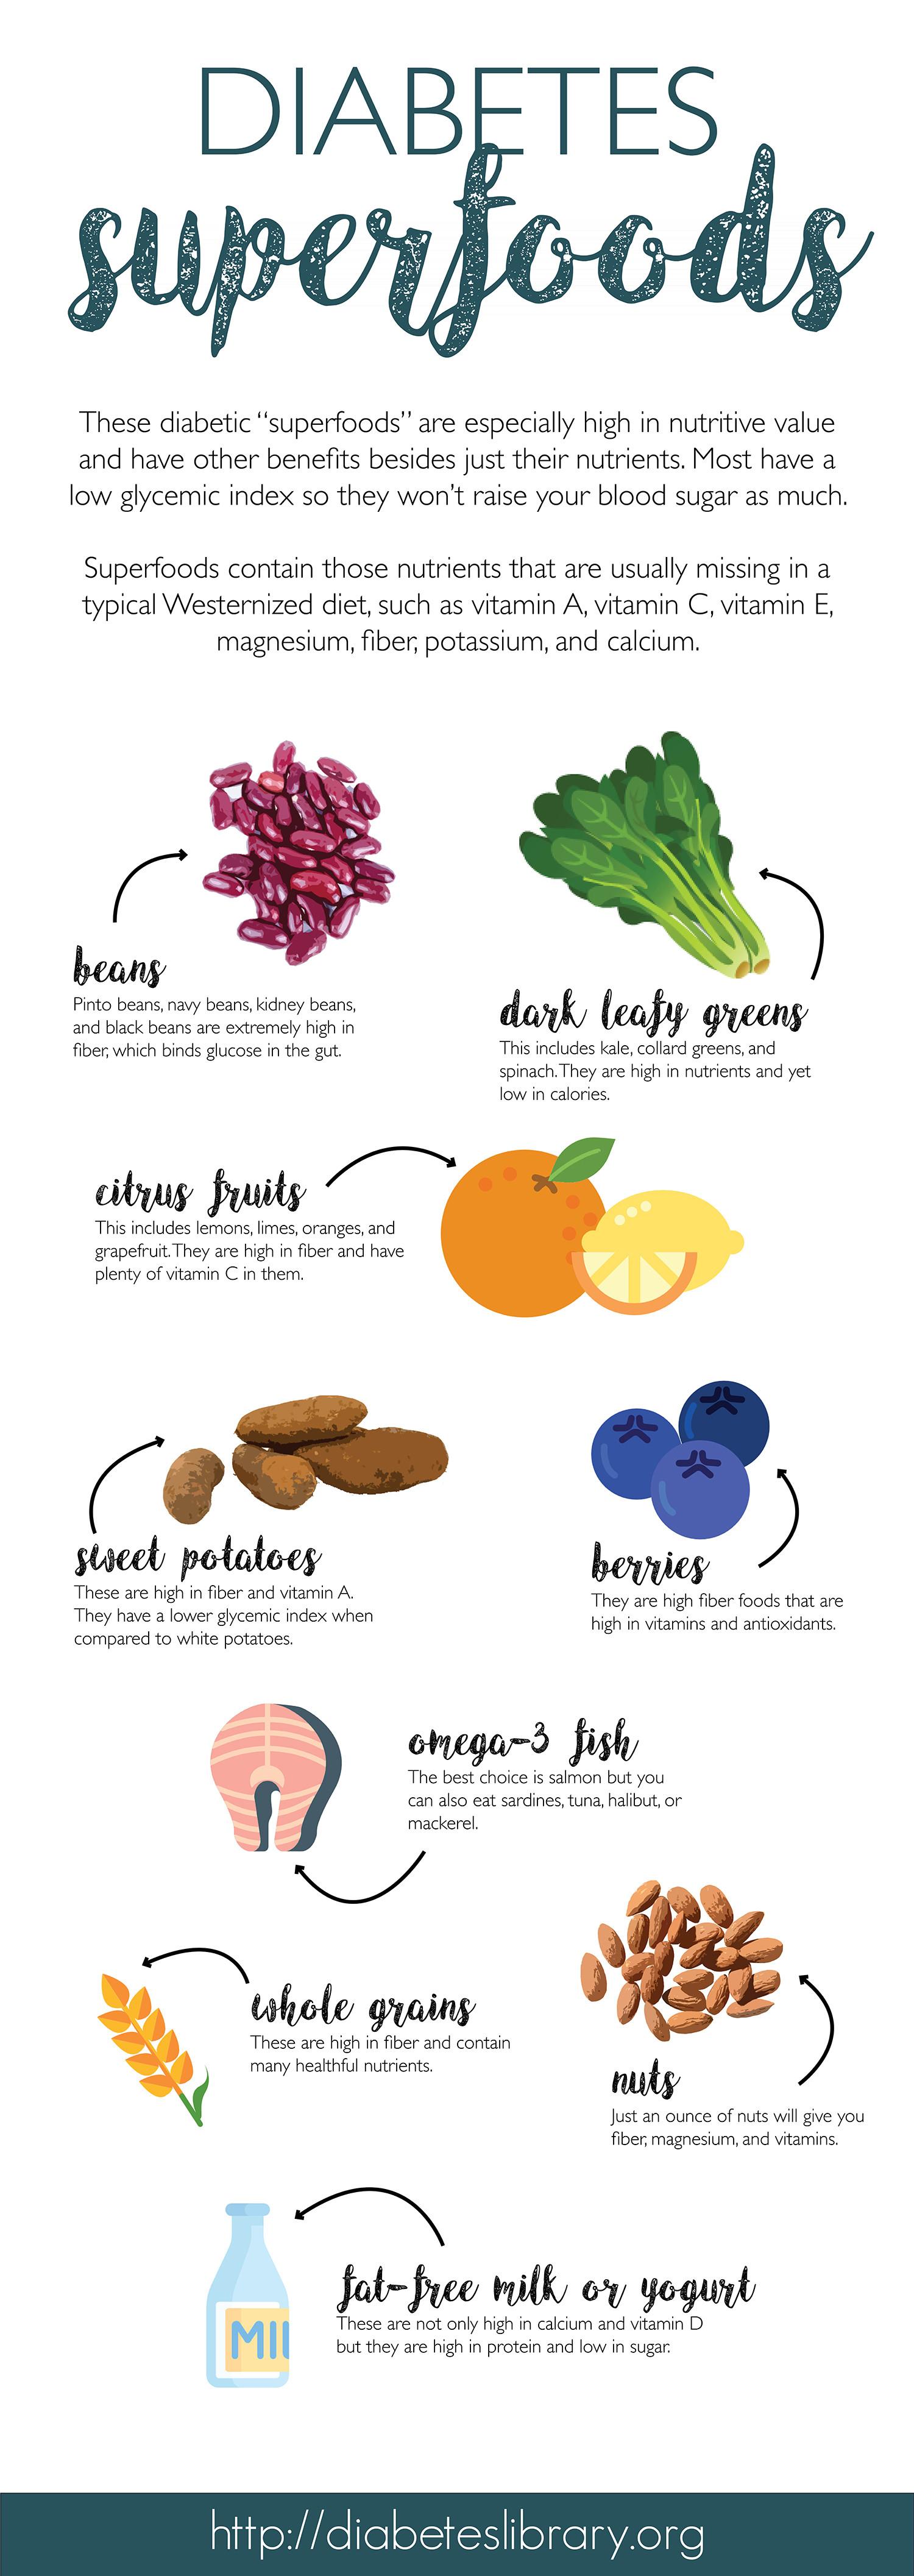 List Of Healthy Snacks For Diabetics  Diabetes Food List